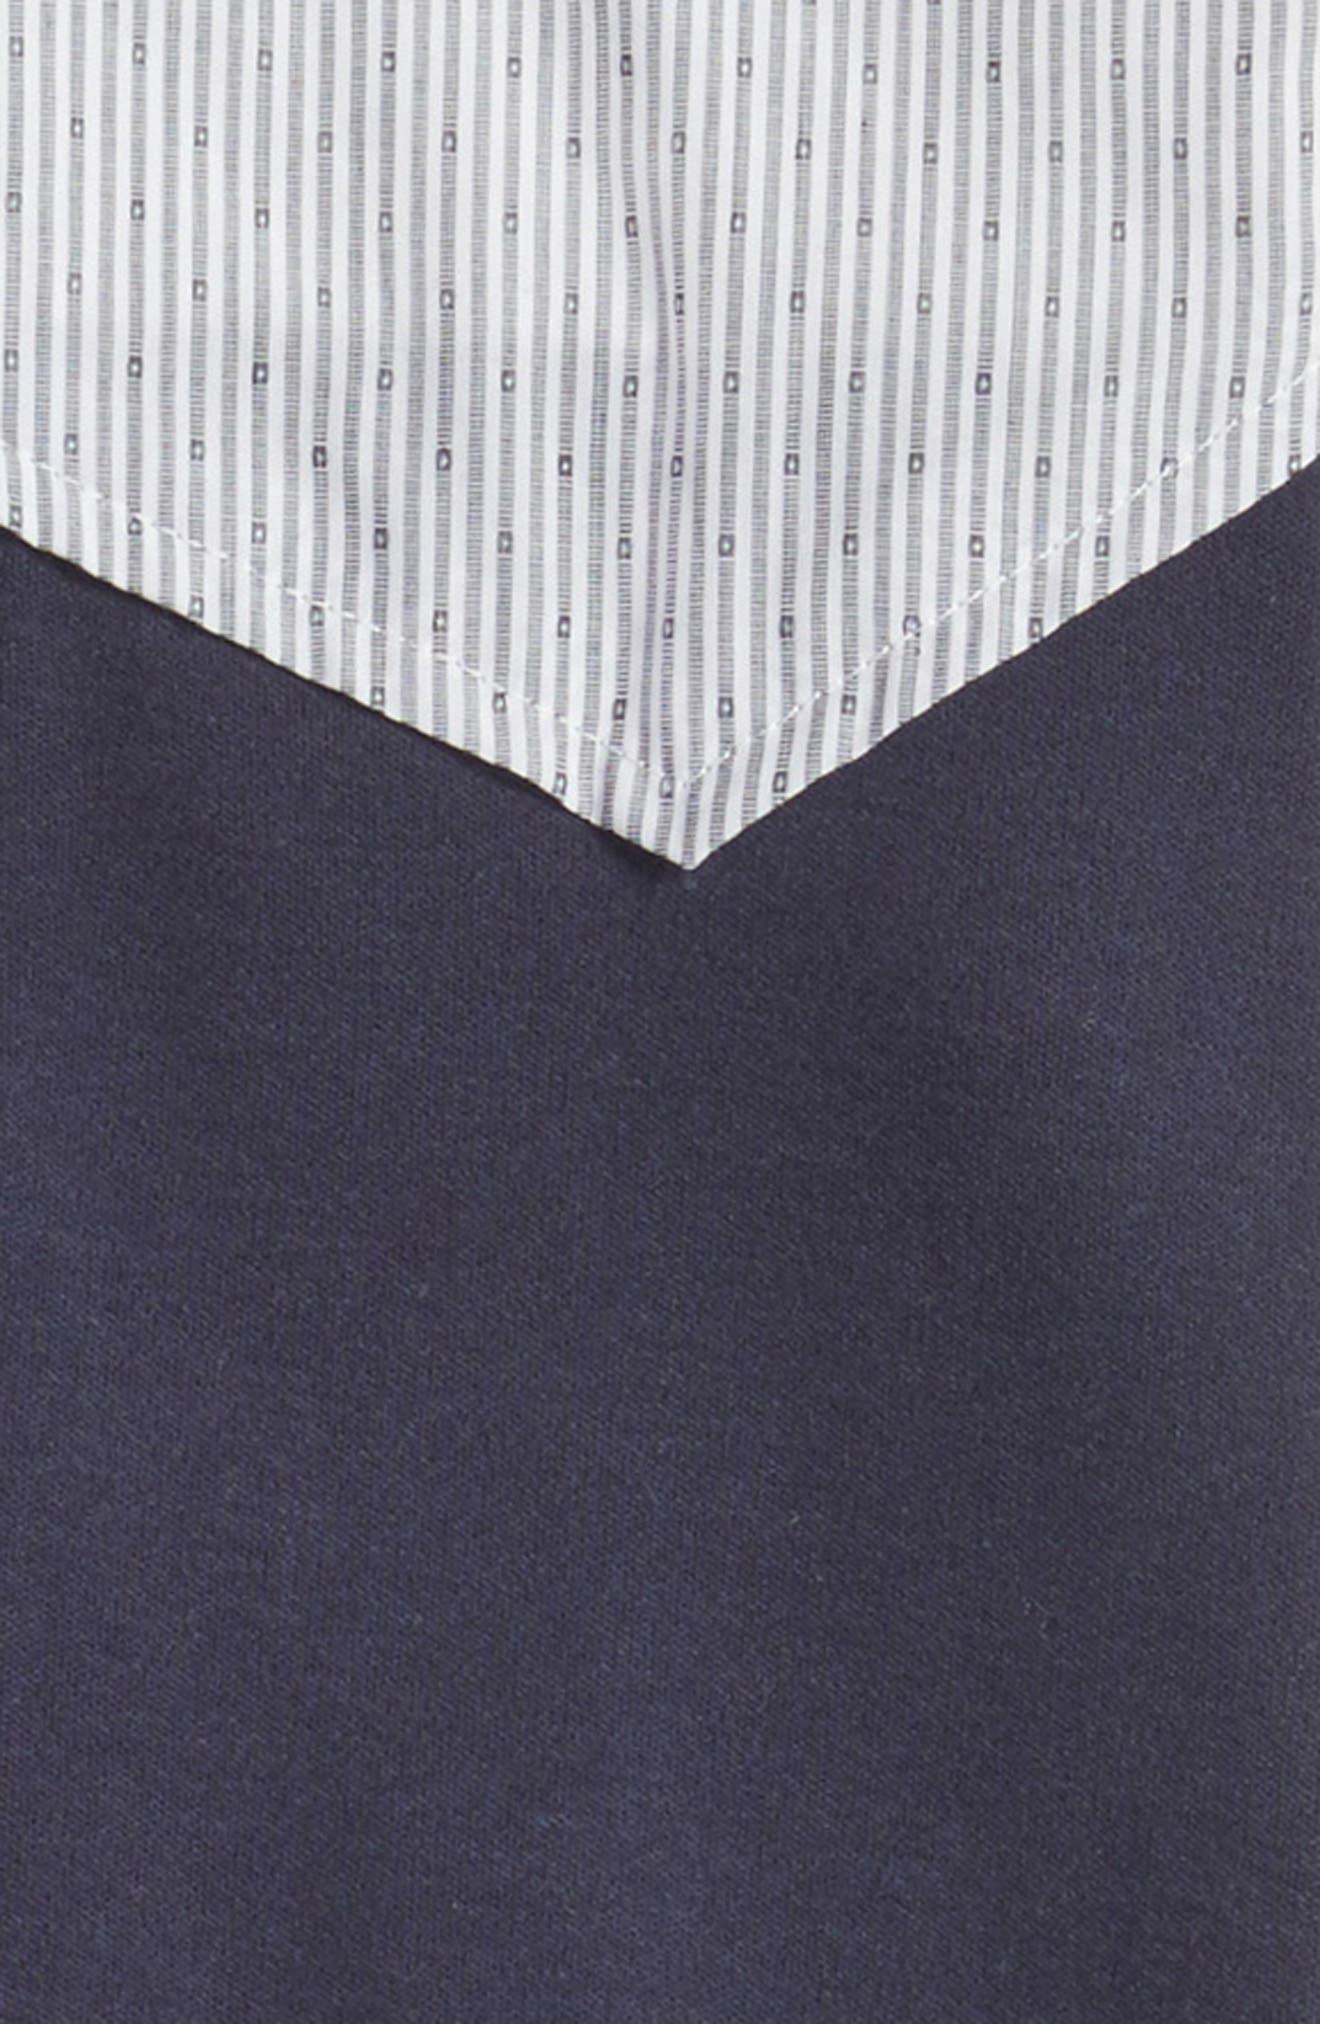 Alternate Image 2  - Armani Junior Vest Romper (Baby Boys)